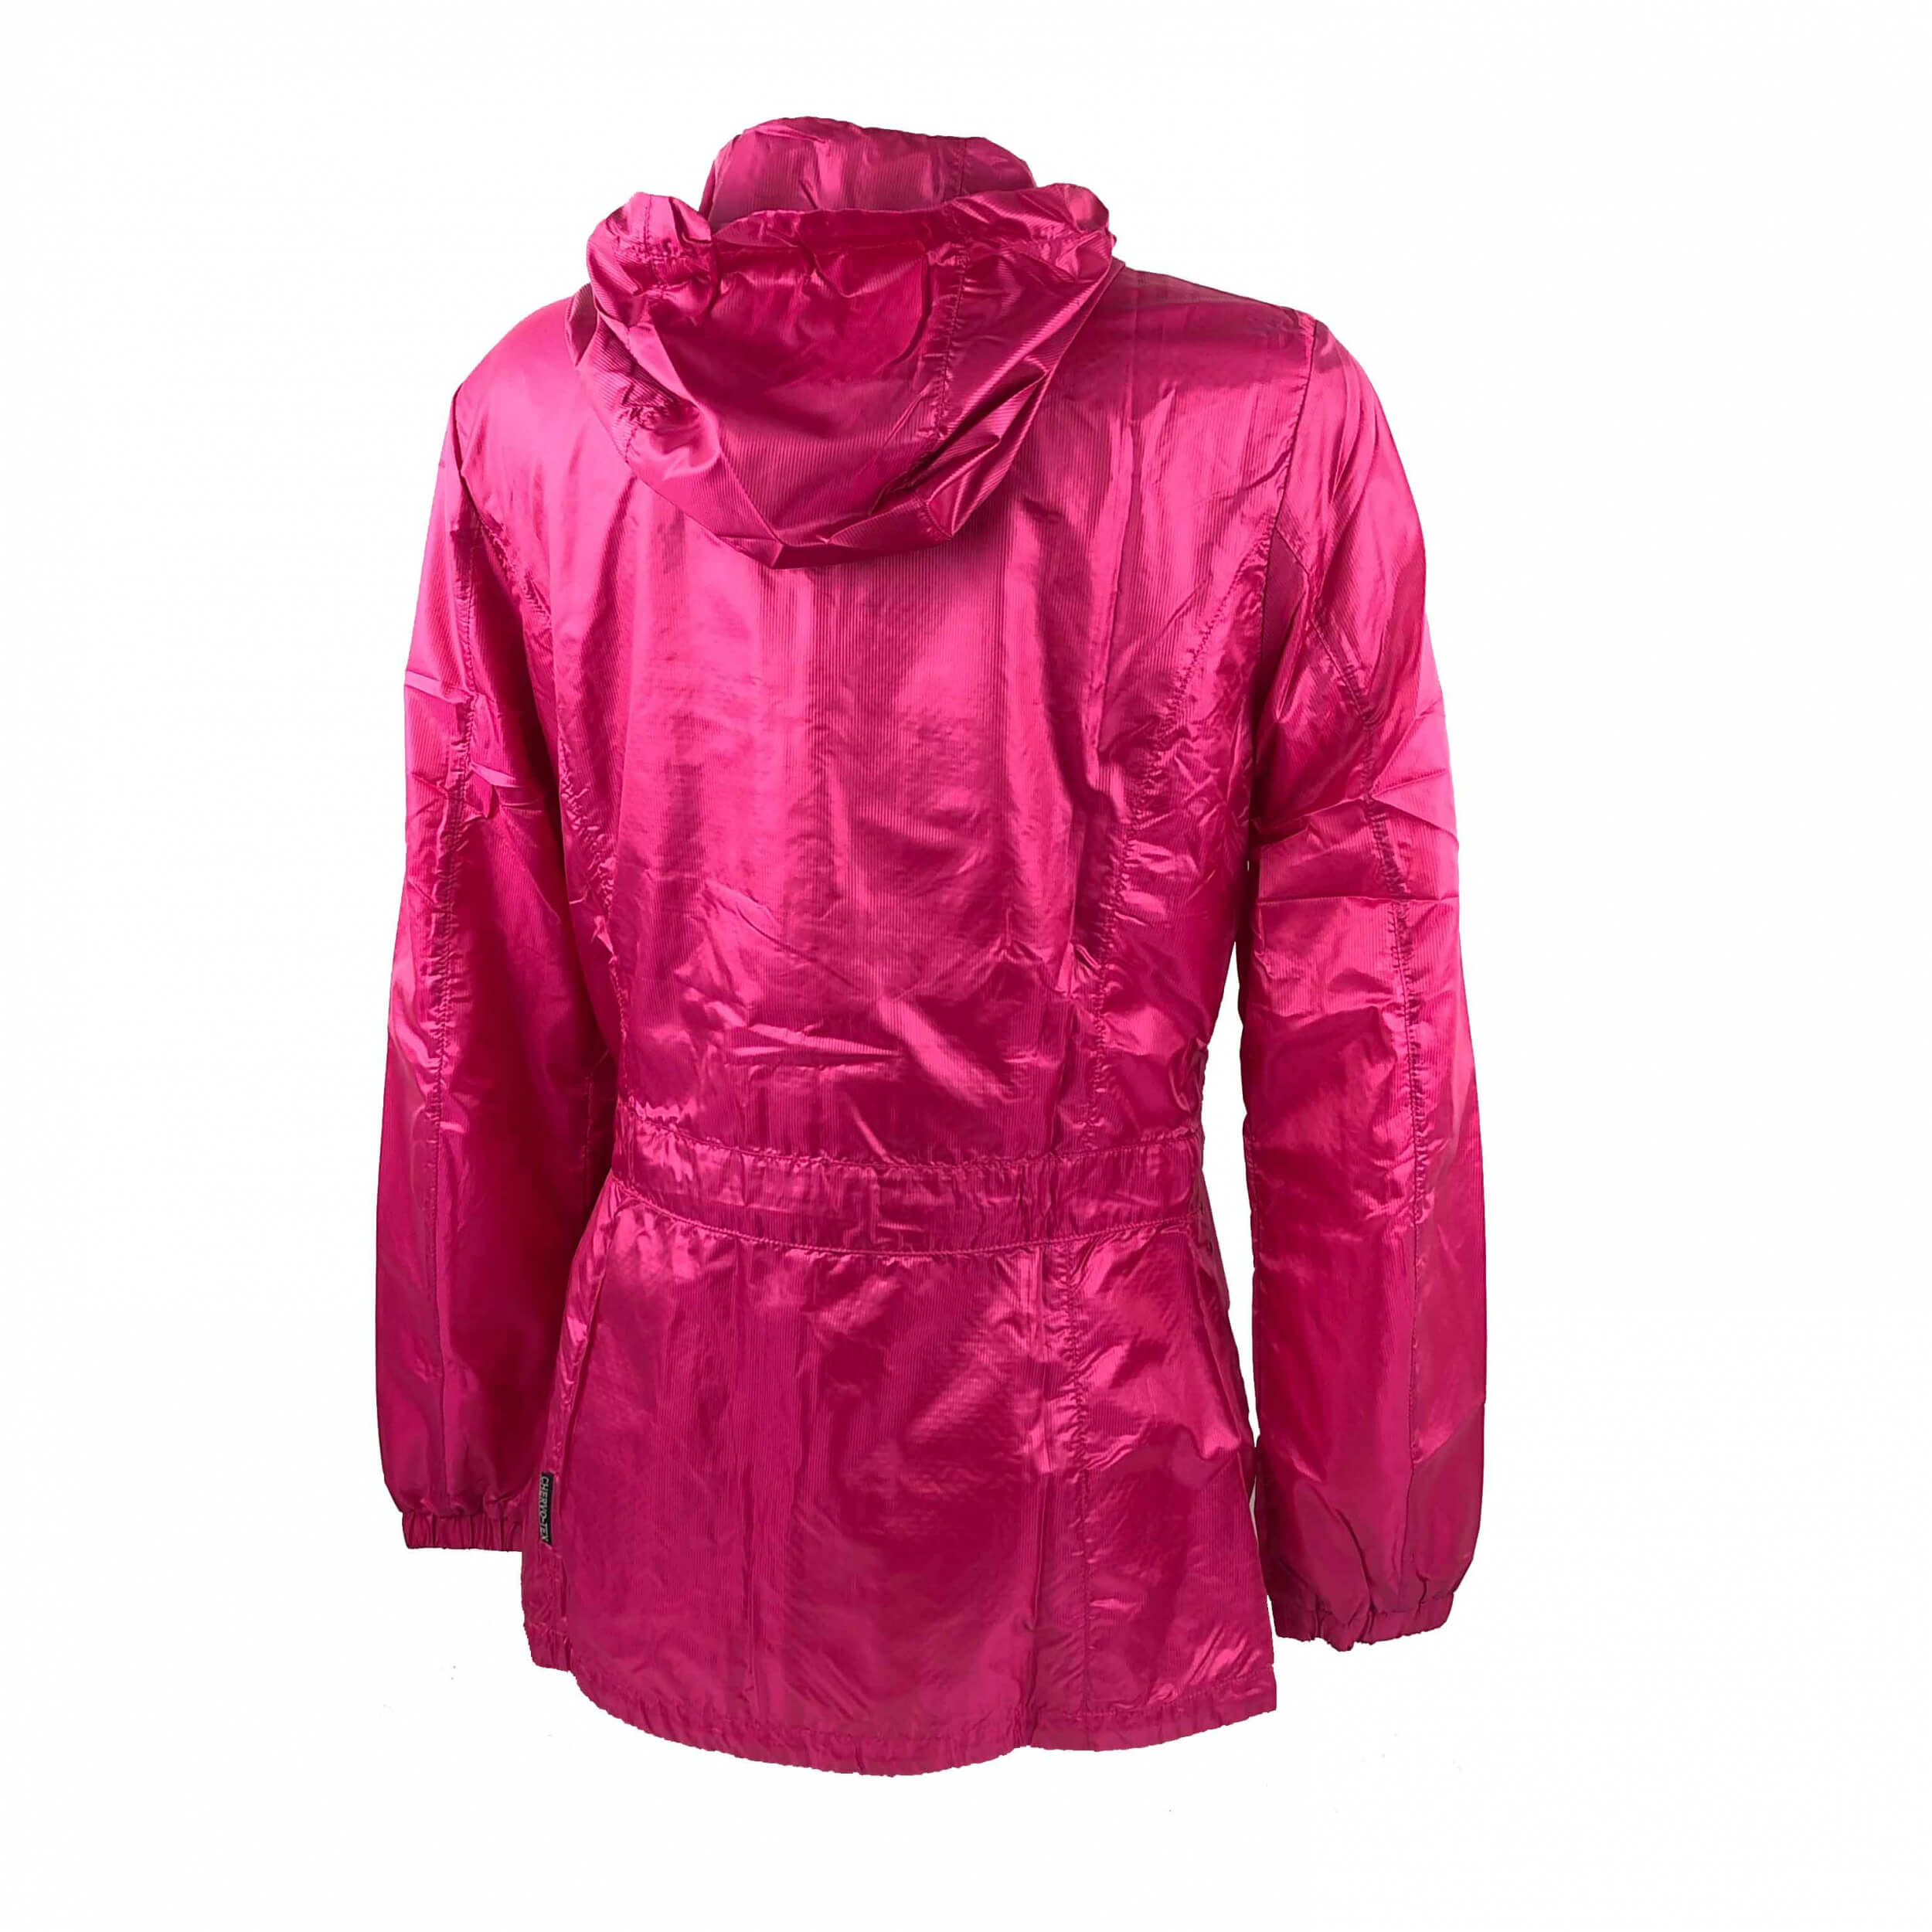 Chervo leicht gefütterte Damen Windjacke WIND LOCK Malorie pink 742